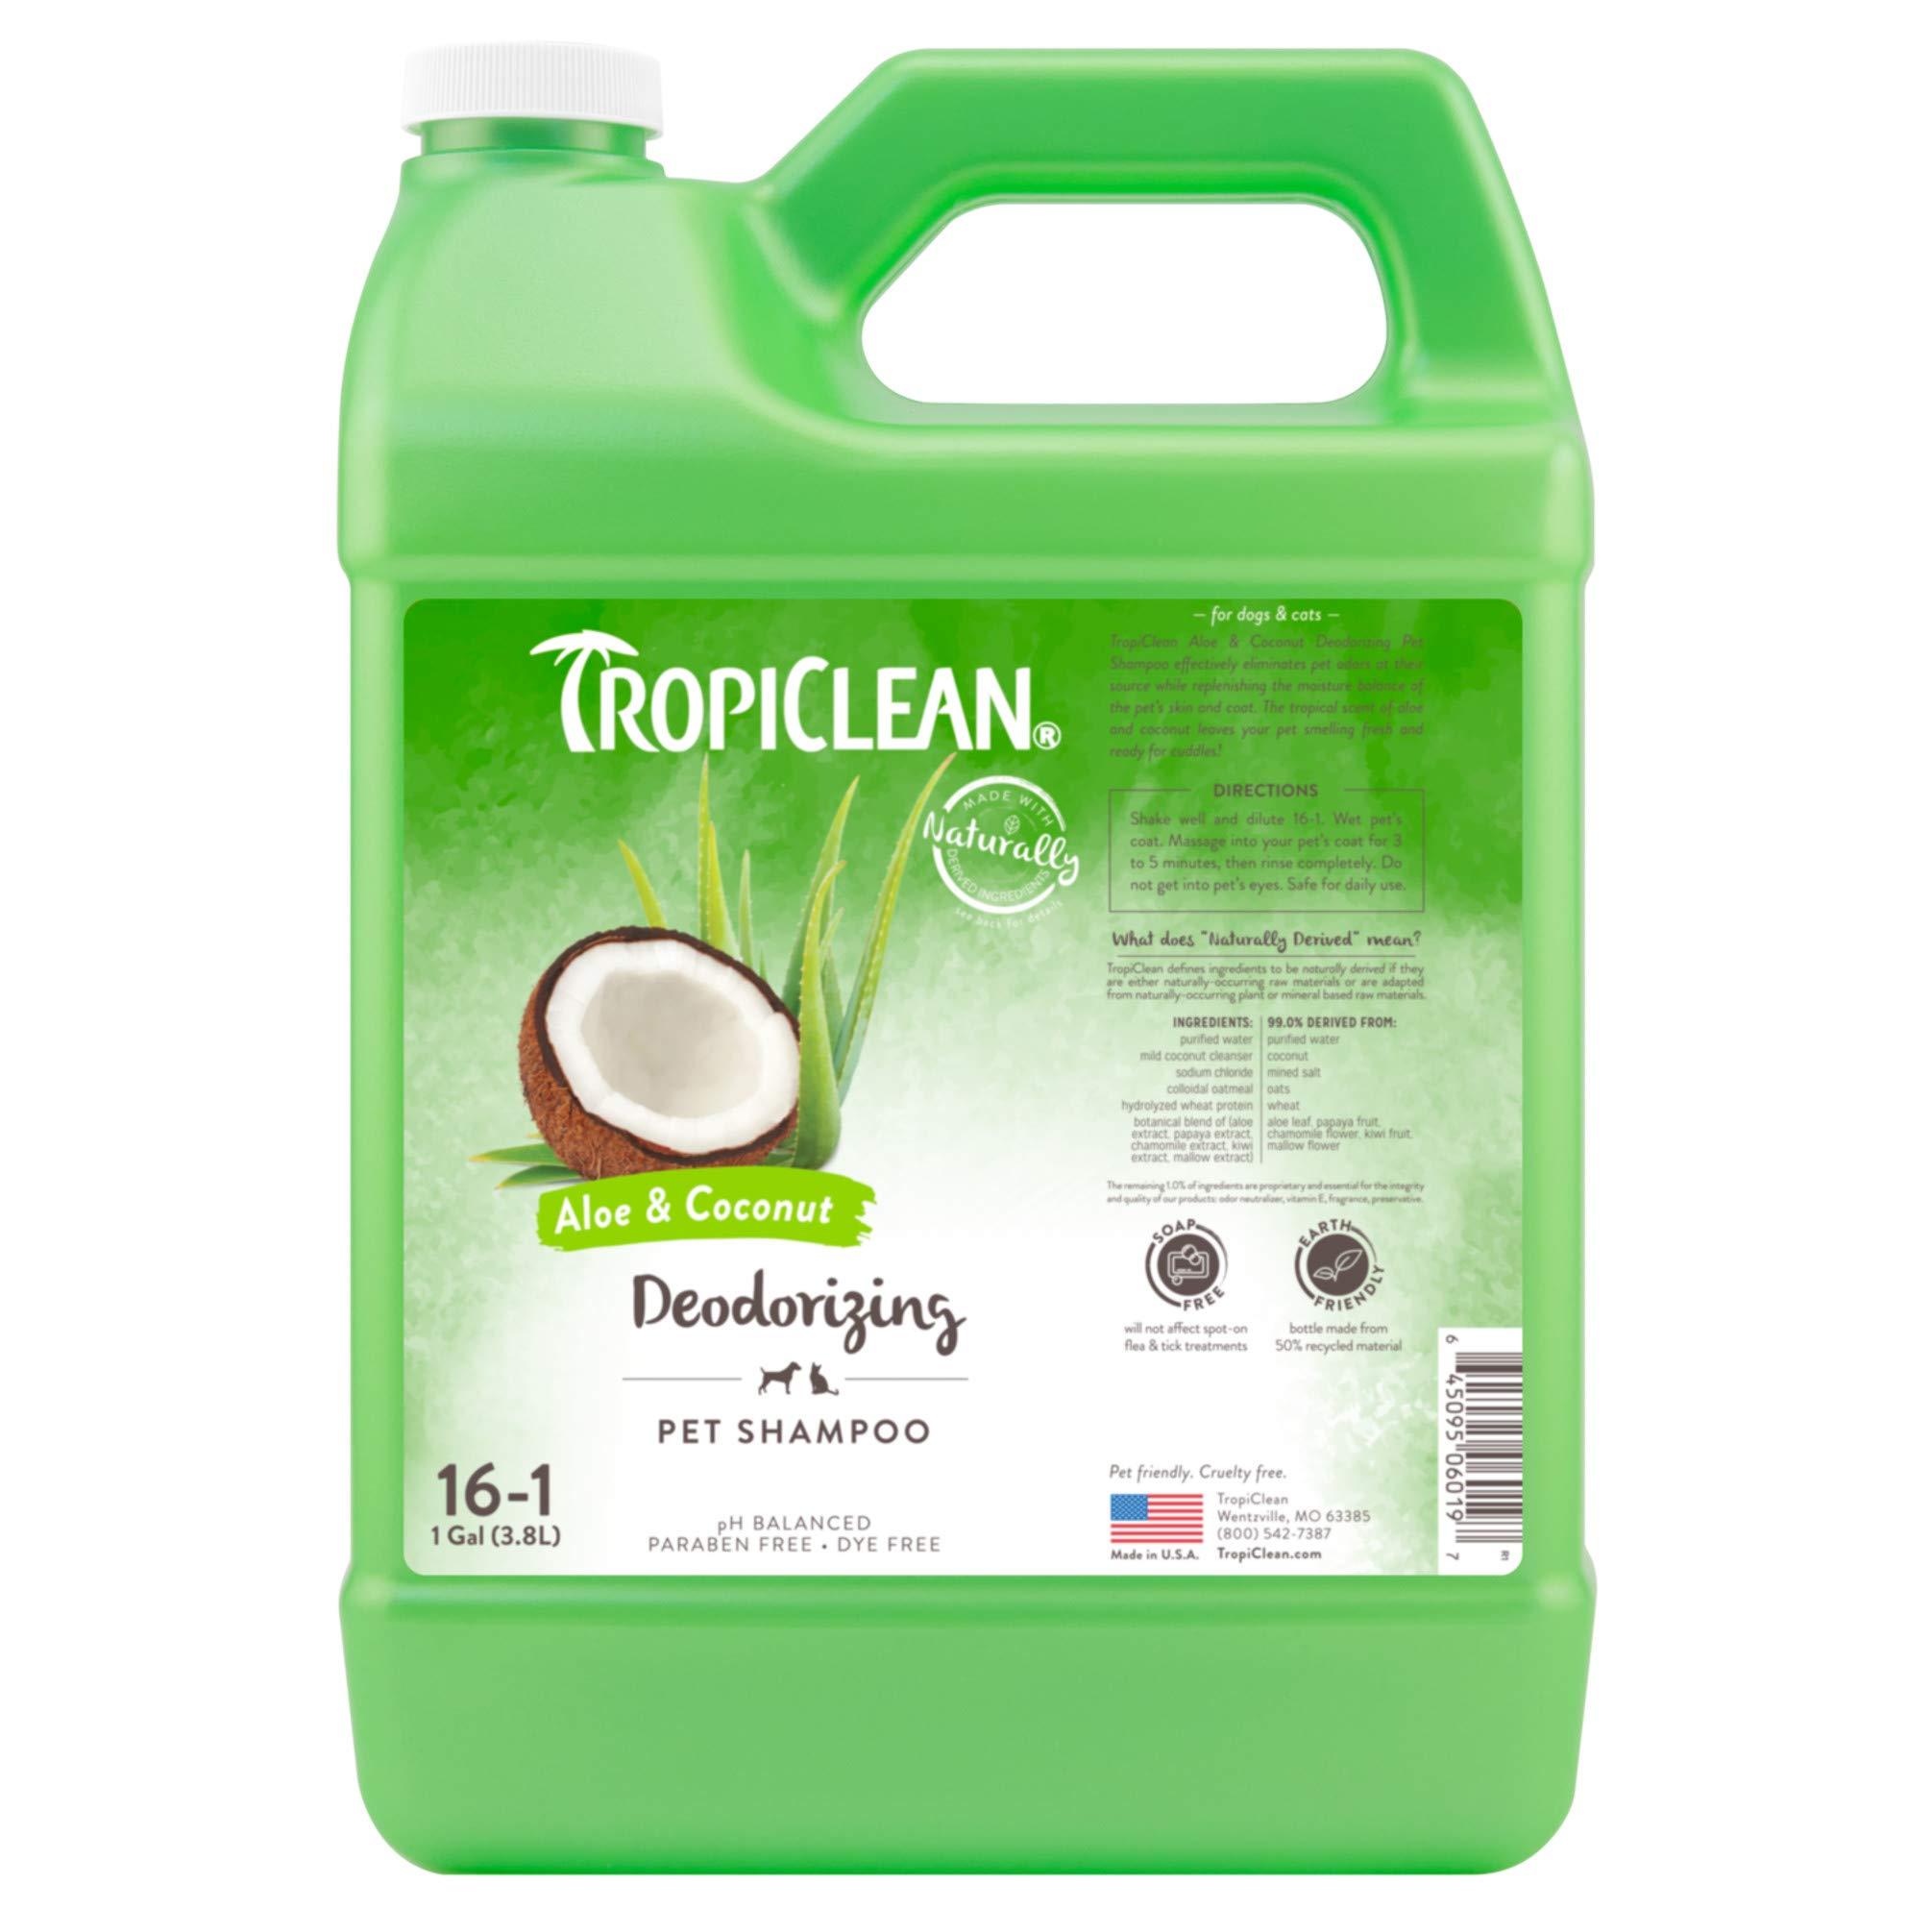 Tropiclean Deodorizing Aloe and Coconut Pet Shampoo, 1 Gall by TropiClean